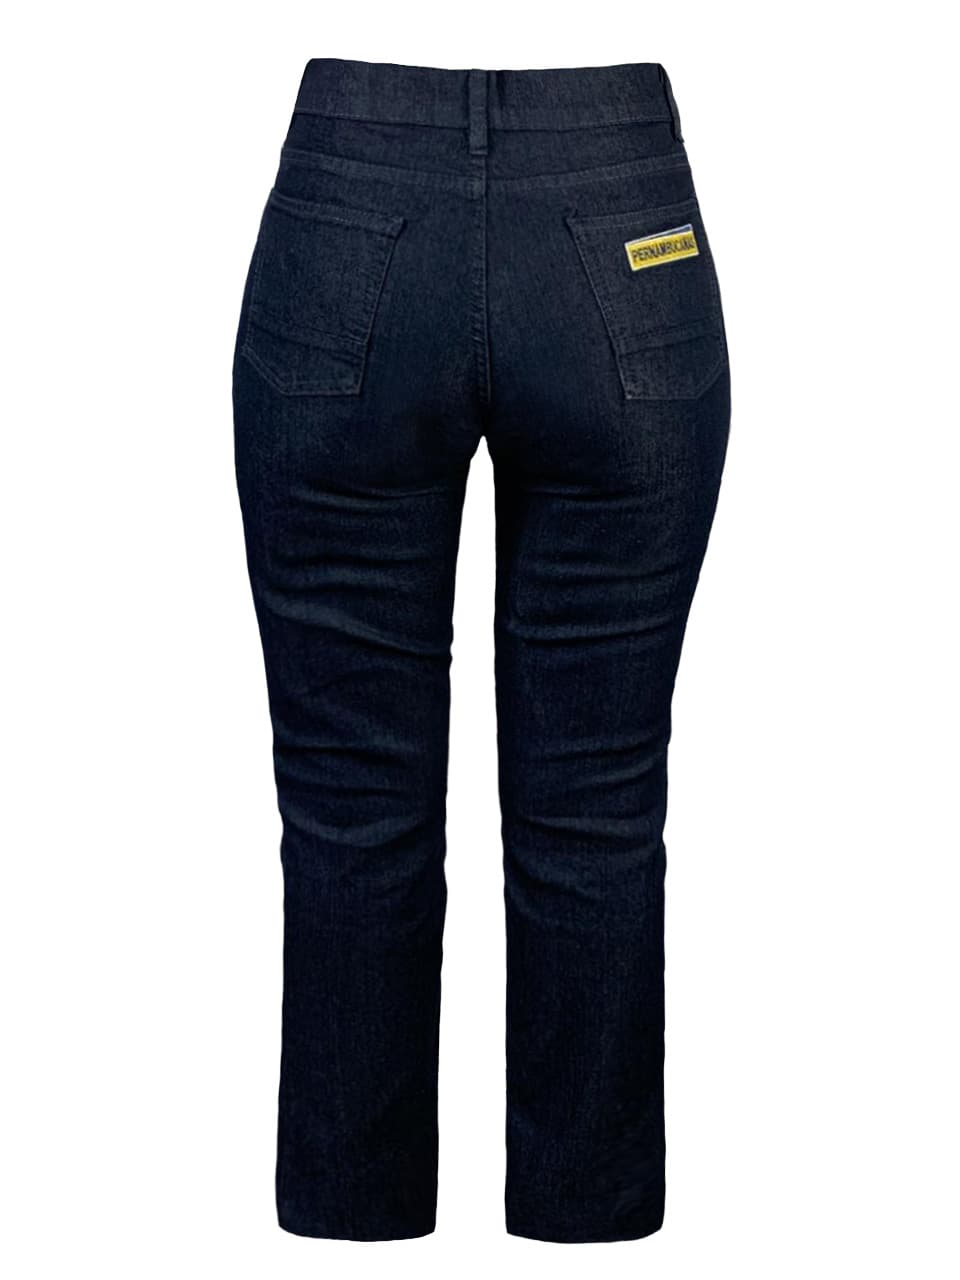 Calça jeans feminina personalizada bolso